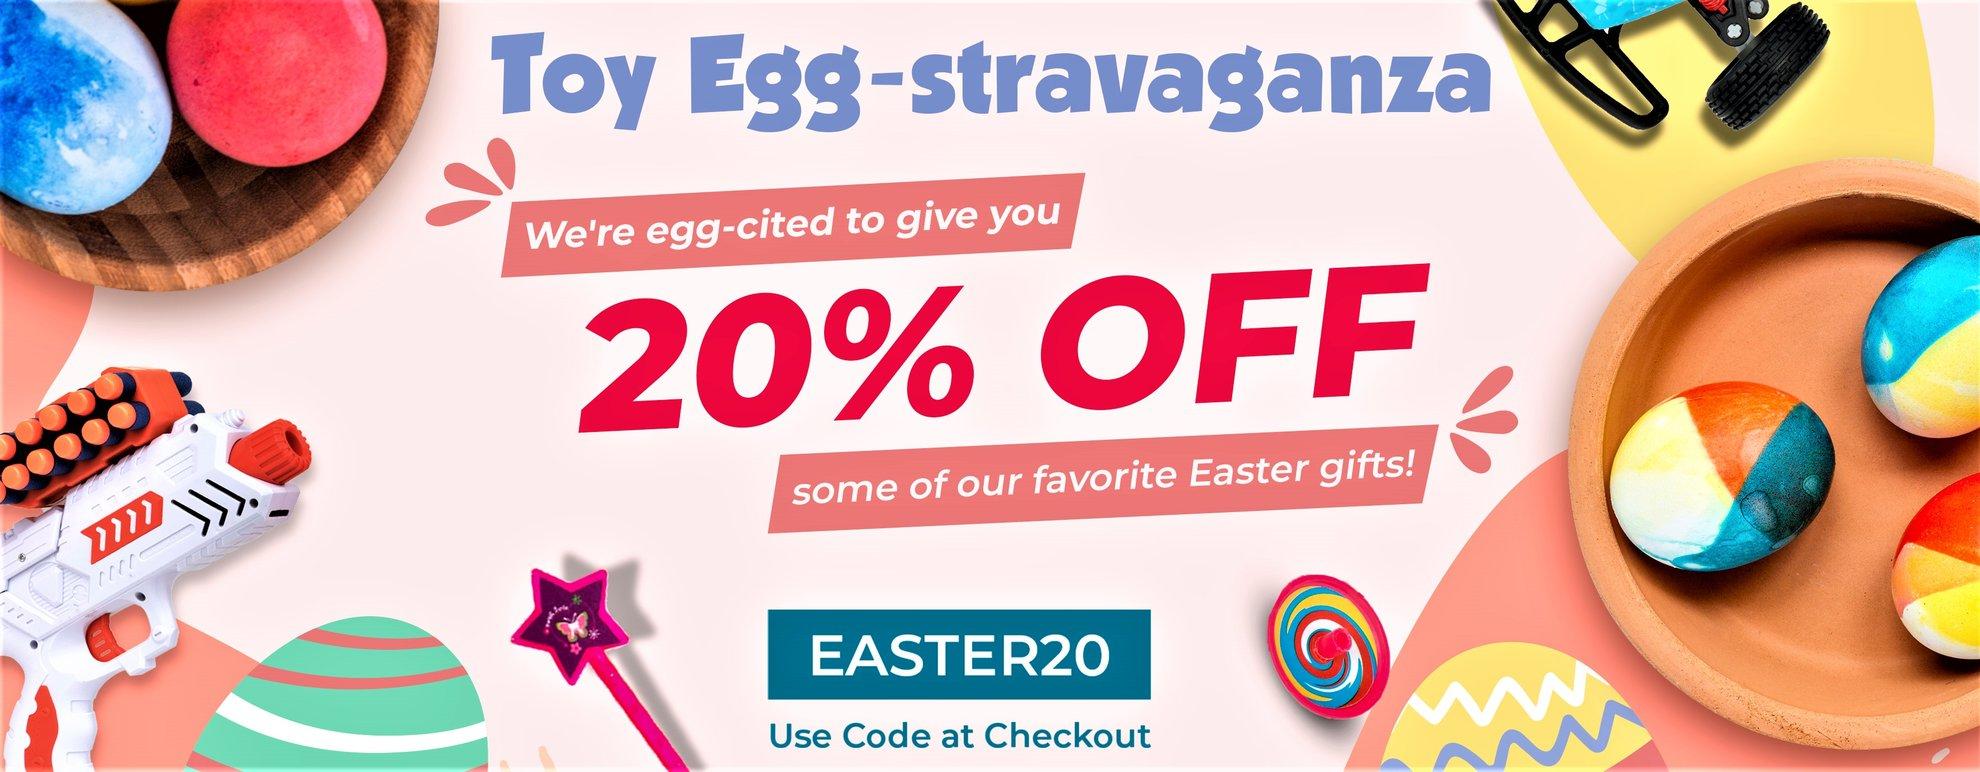 Toy Eggstravaganza - USA Toyz